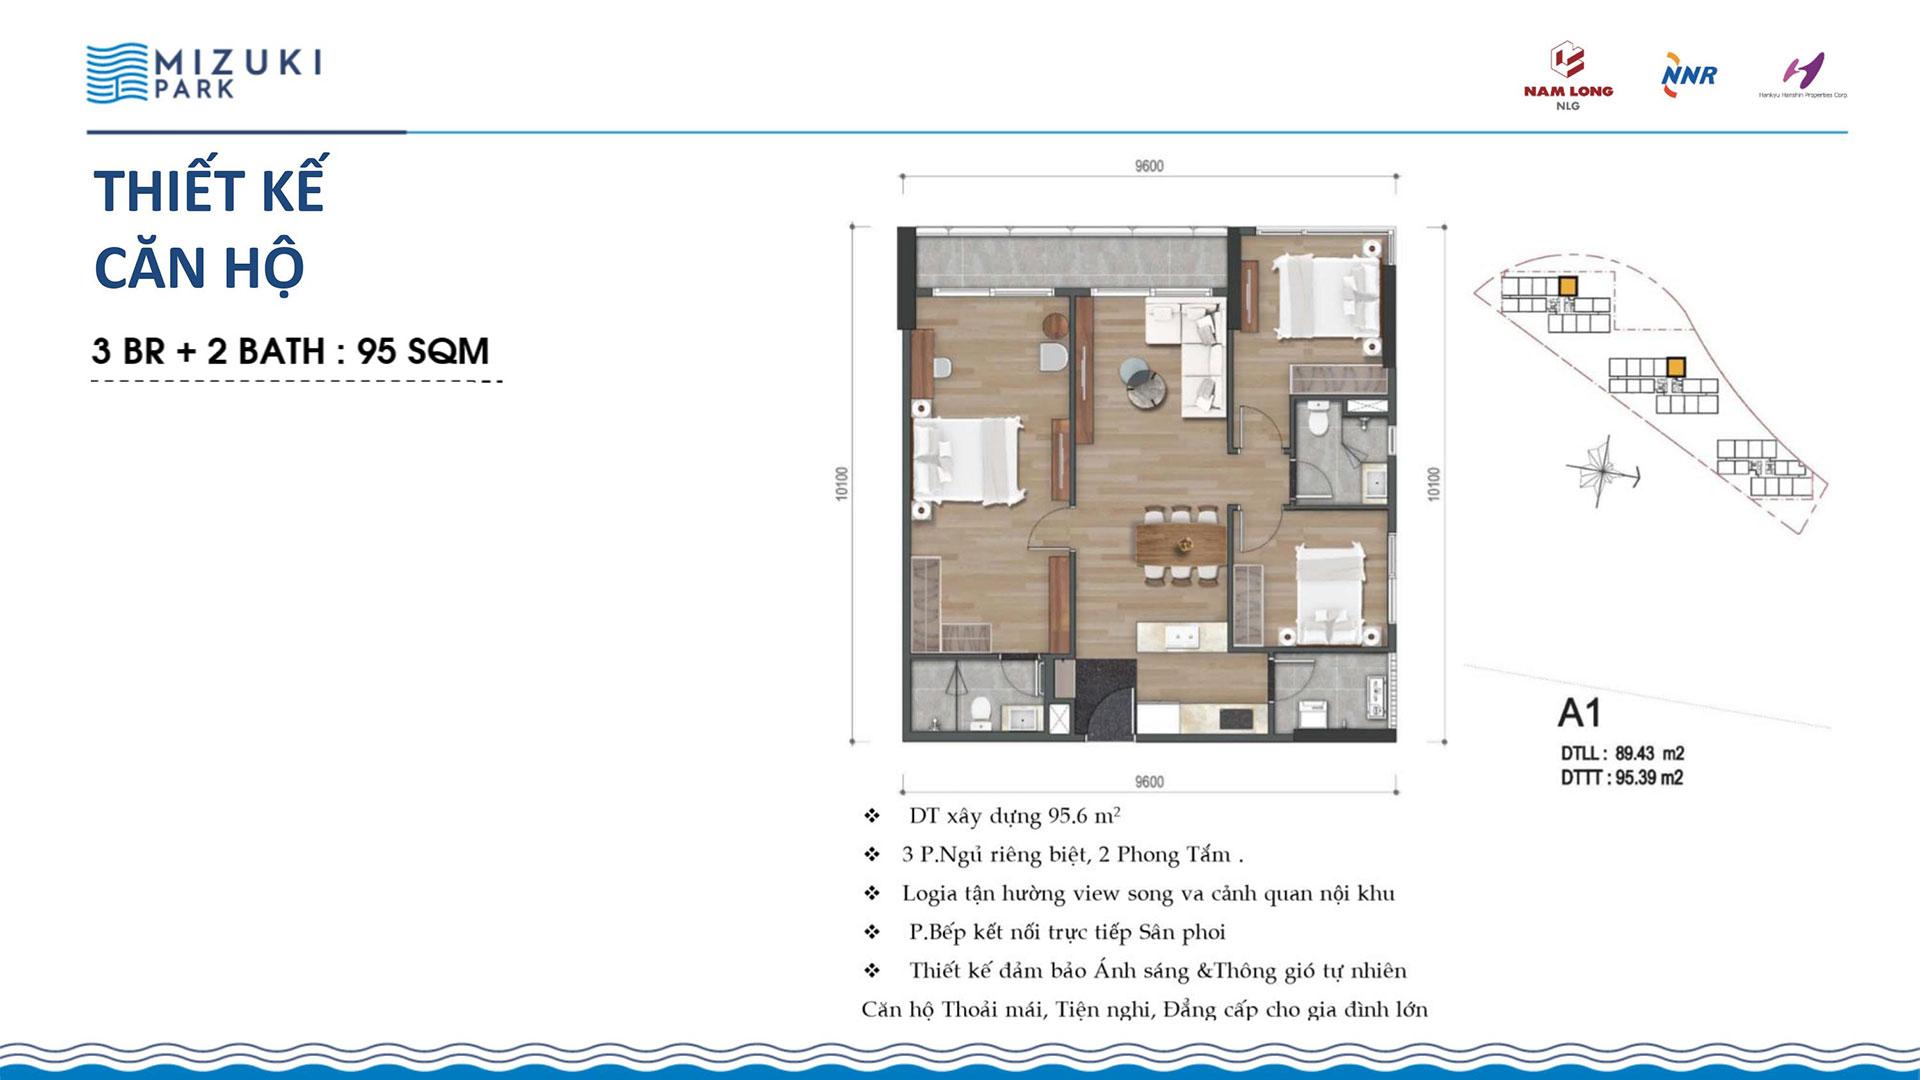 Thiết kế căn hộ Mizuki Park 95m2